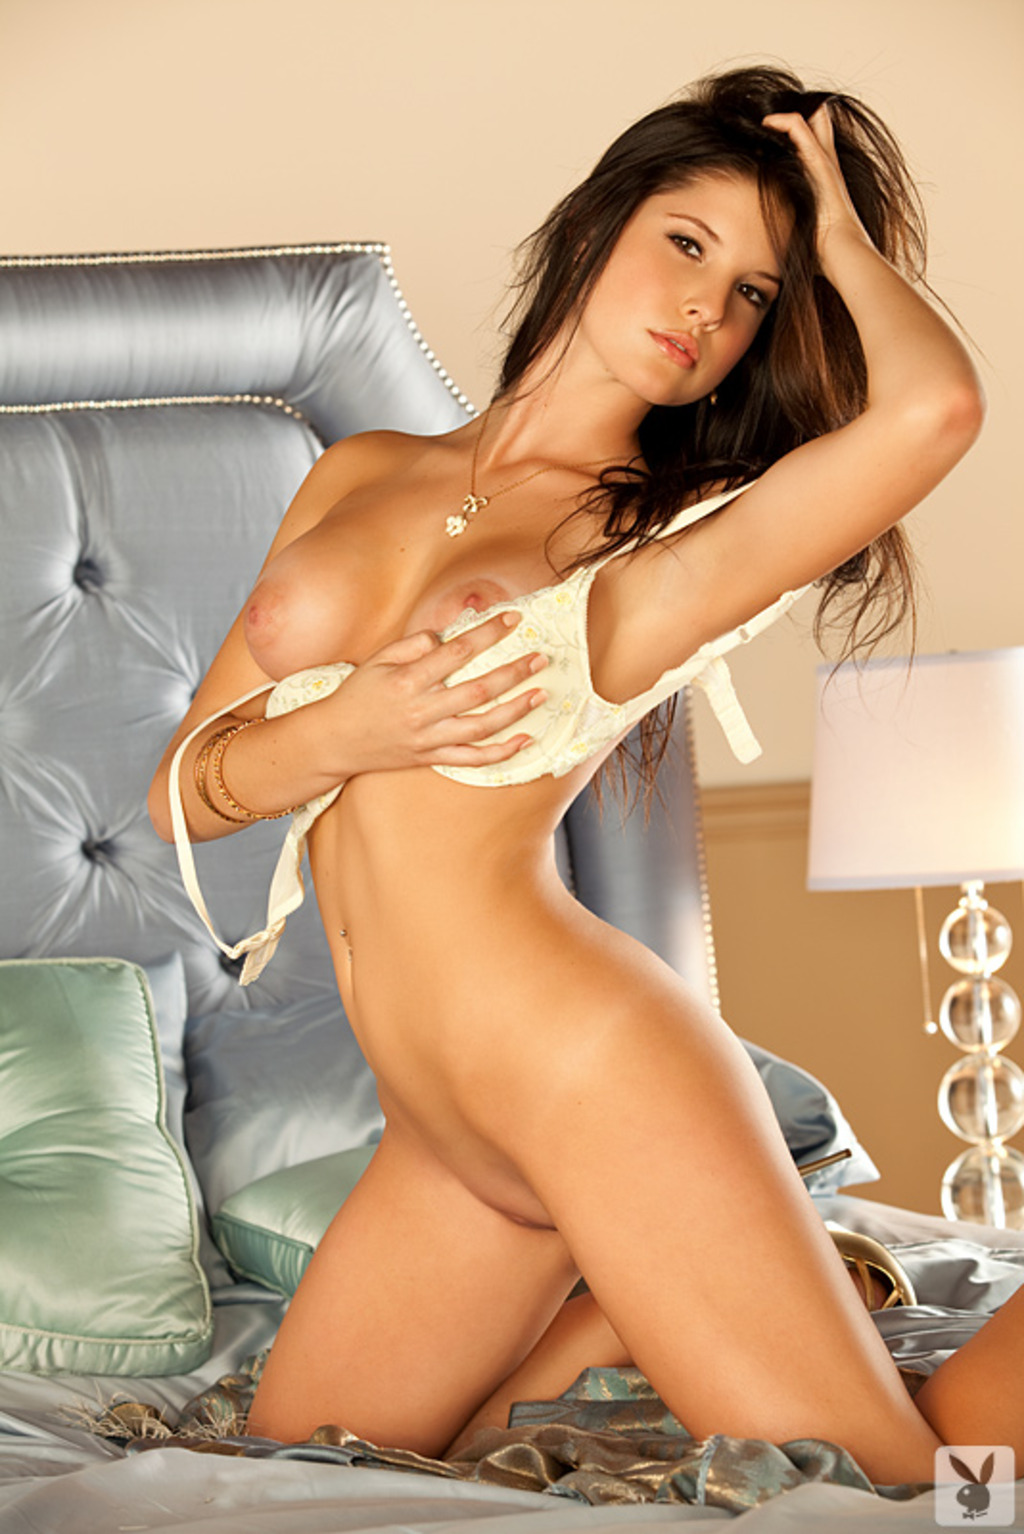 amanda cerny - naked women | nude women | free nude girls